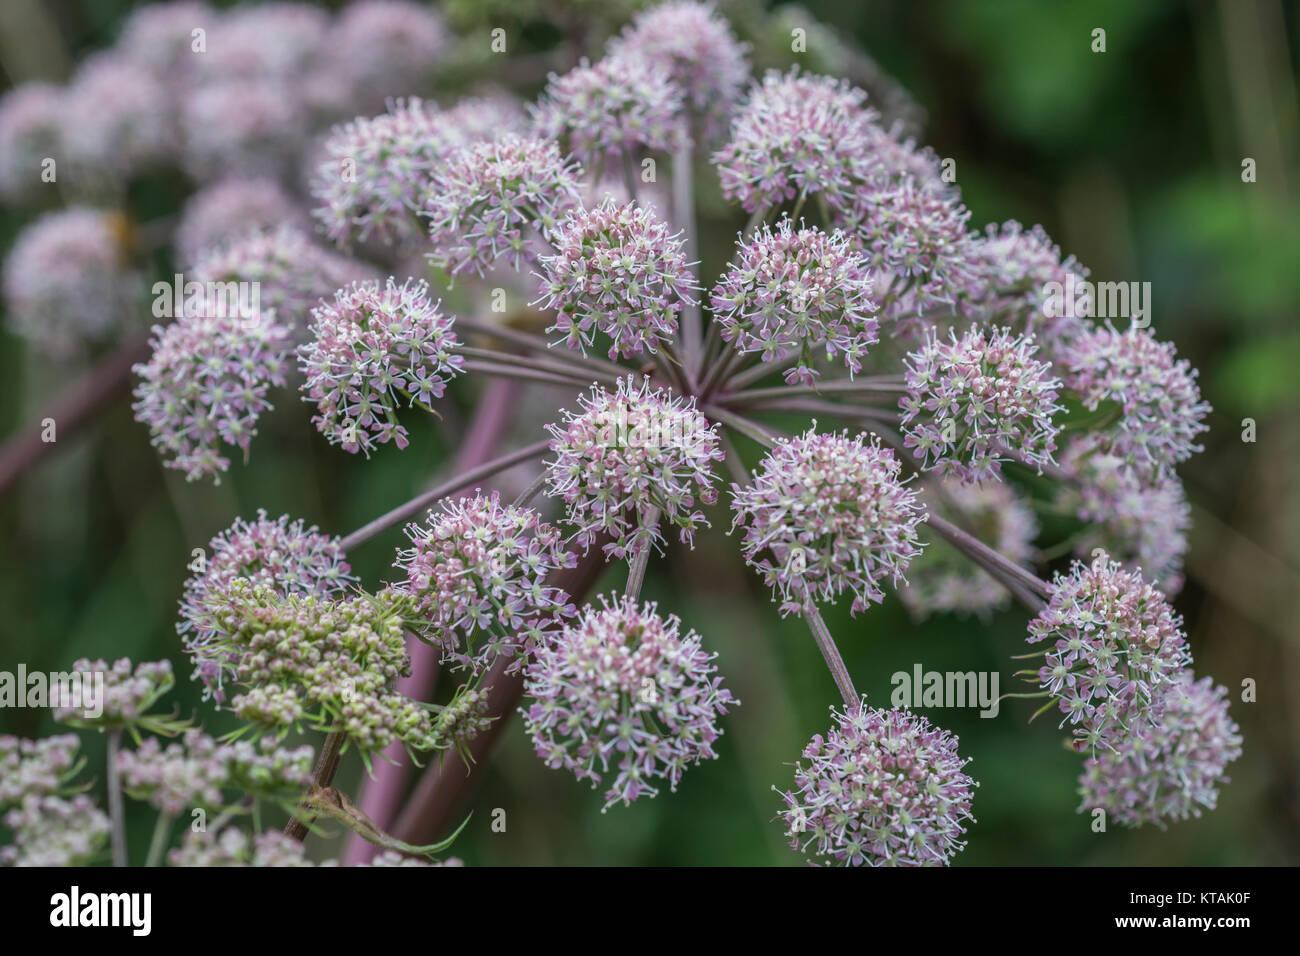 Flower head of Wild Angelica (Angelica sylvestris). - Stock Image